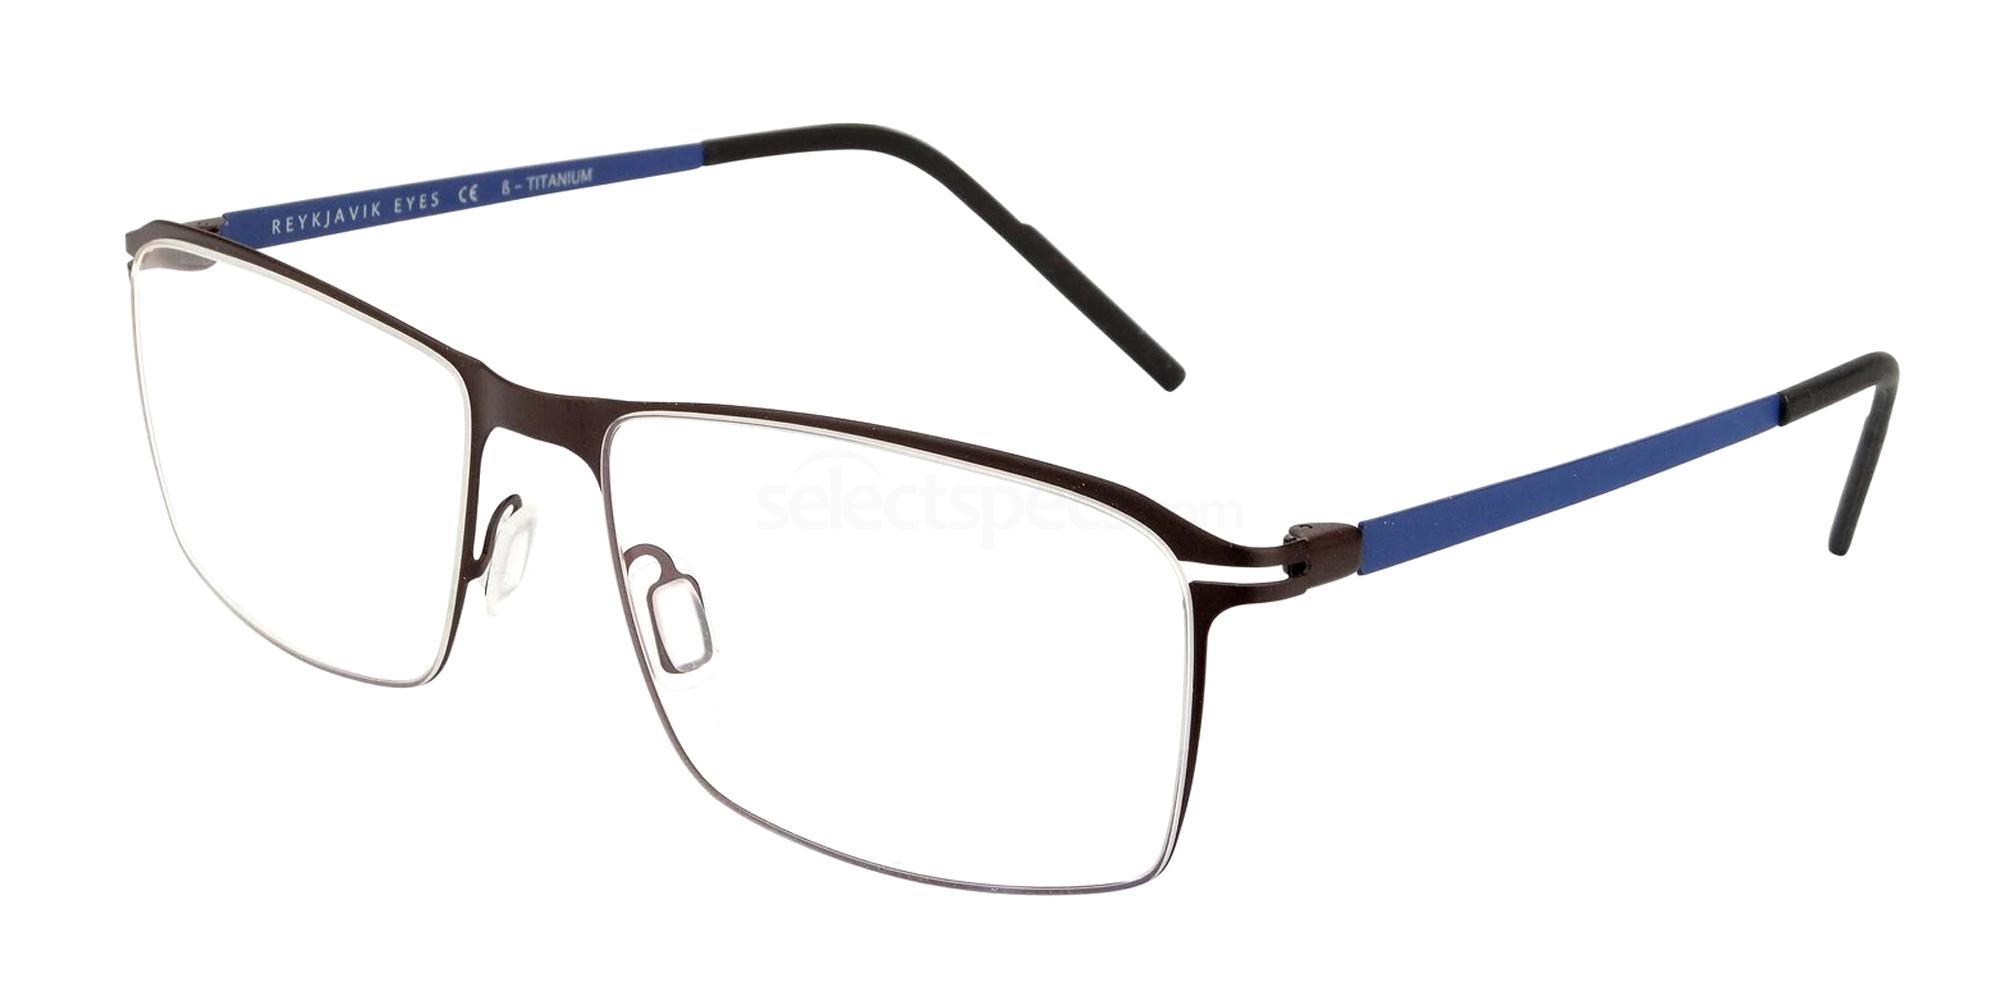 С1 THOR Glasses, Reykjavik Eyes Black Label